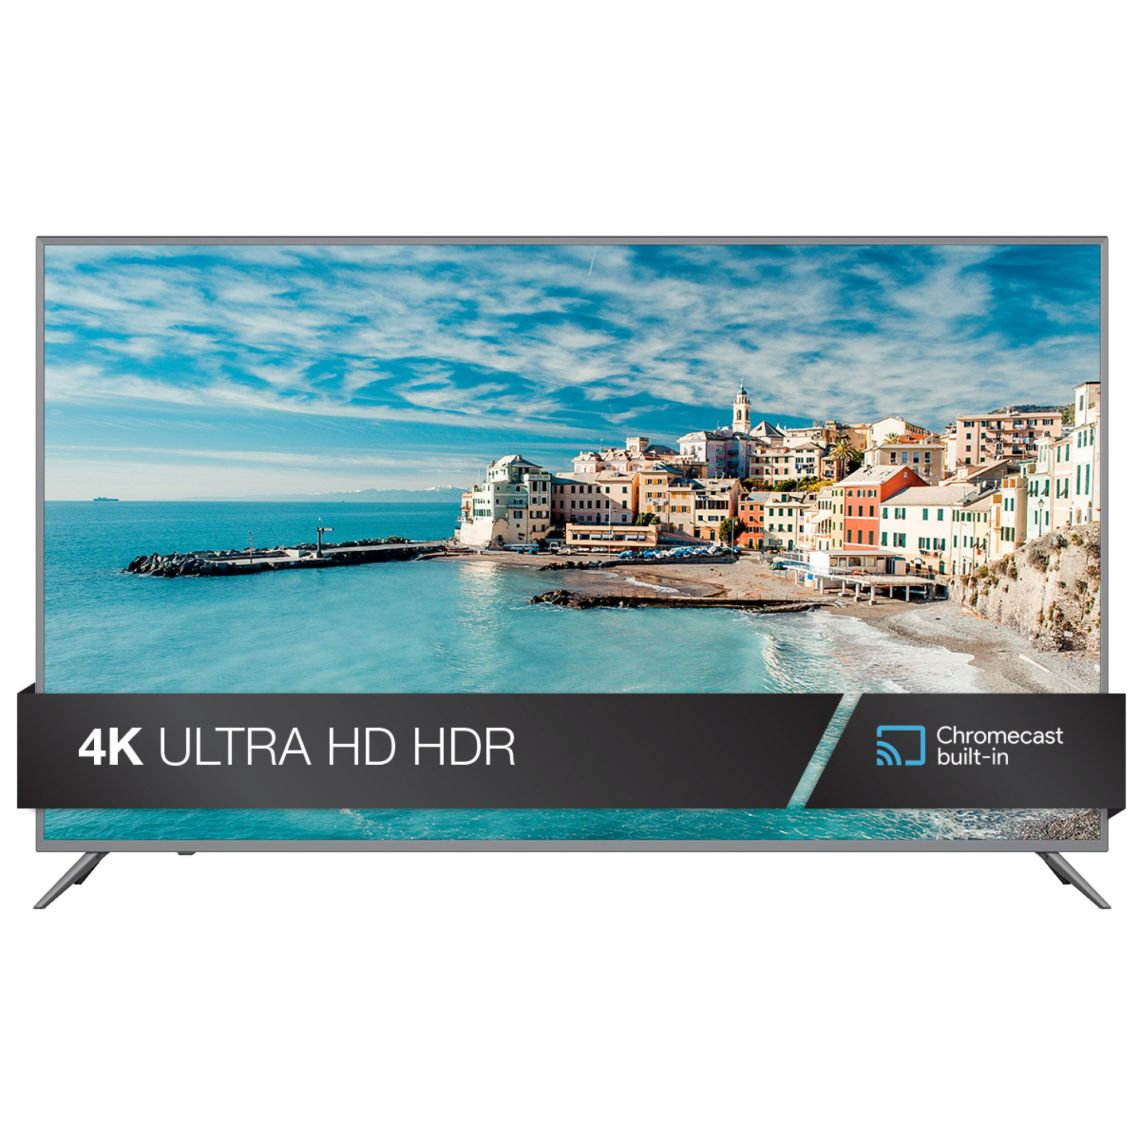 "JVC 65"" CLass 4K (2160p) HDR Smart TV with Built-in Chromecast (LT-65MA875) - Walmart.com"